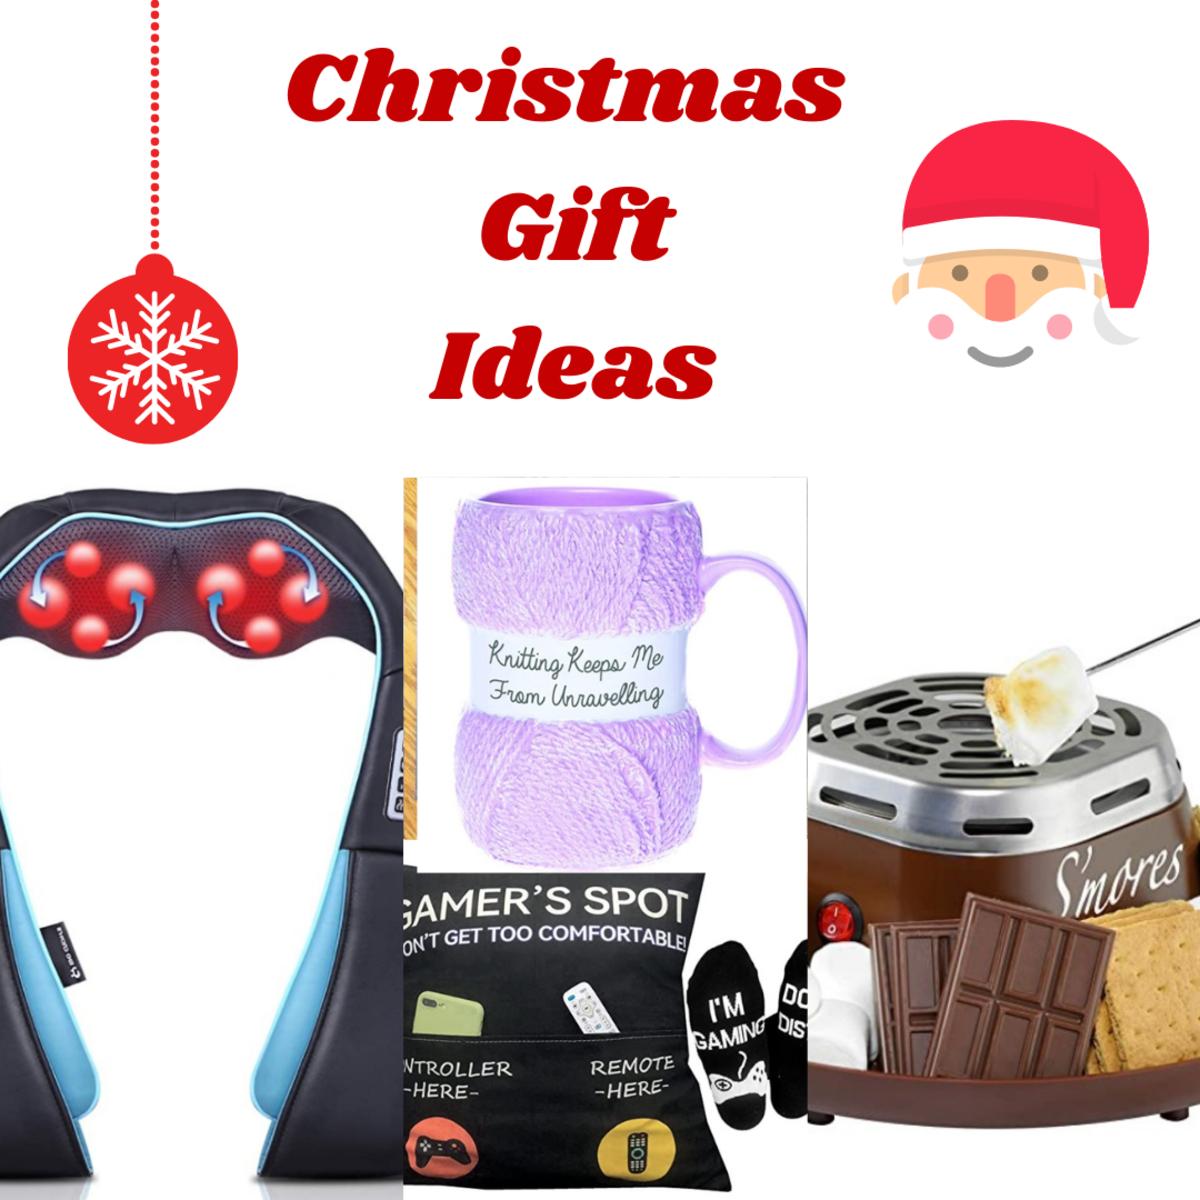 Christmas Gift Ideas on Amazon